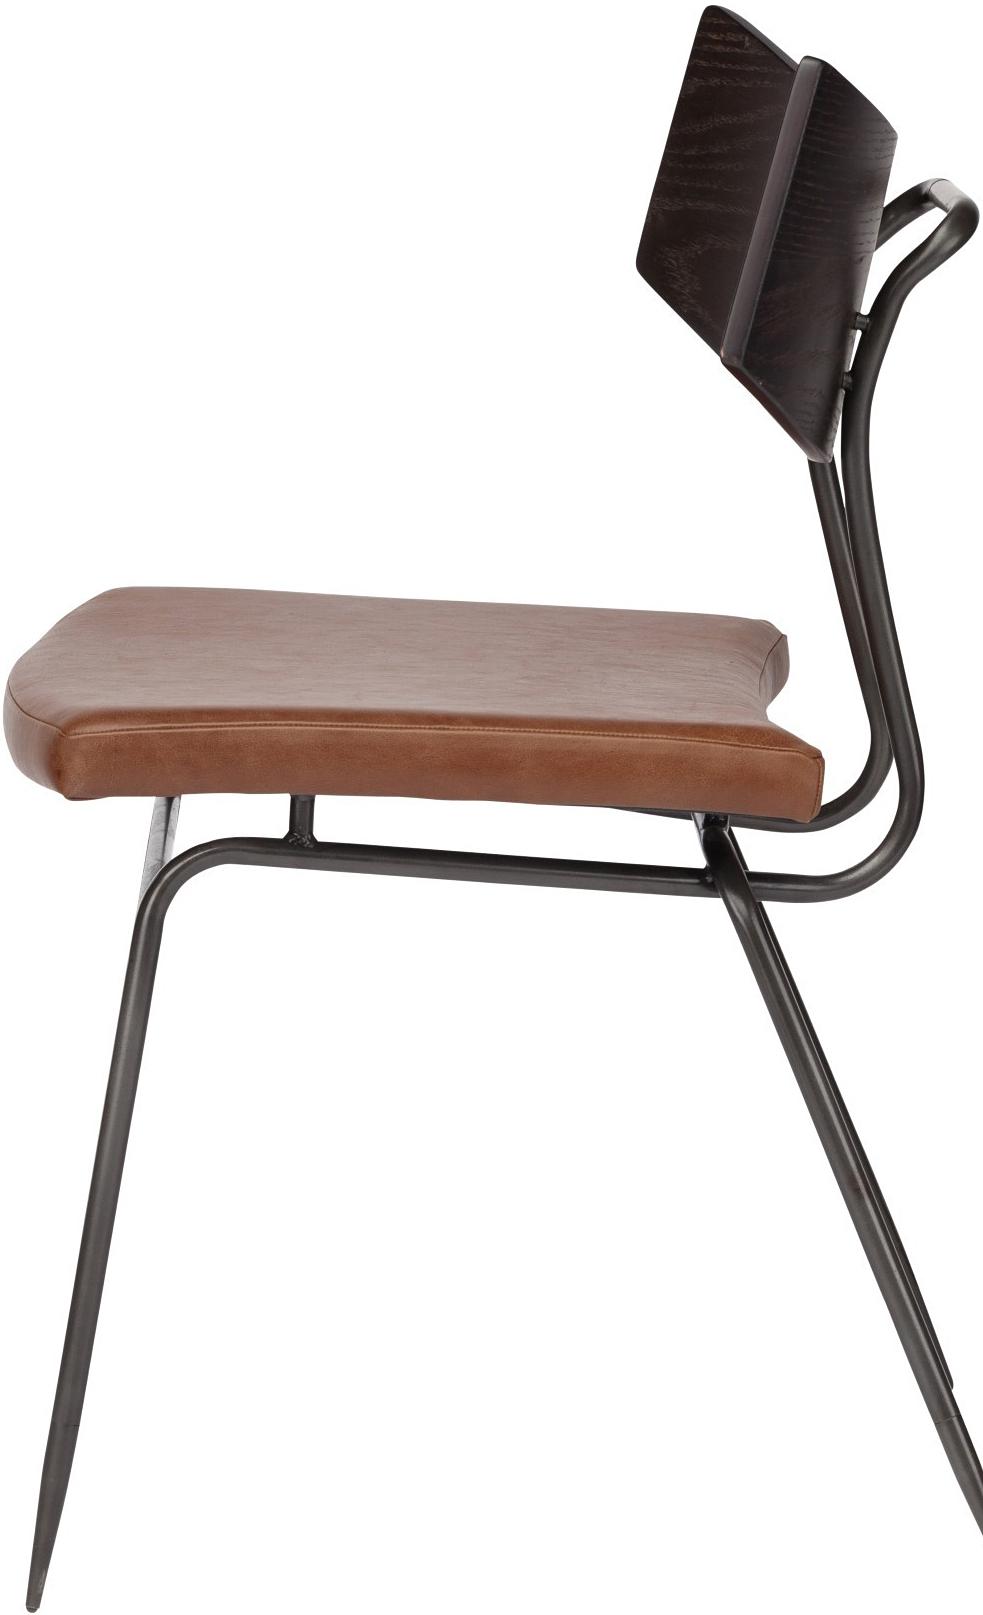 the nuevo soli dining chair caramel